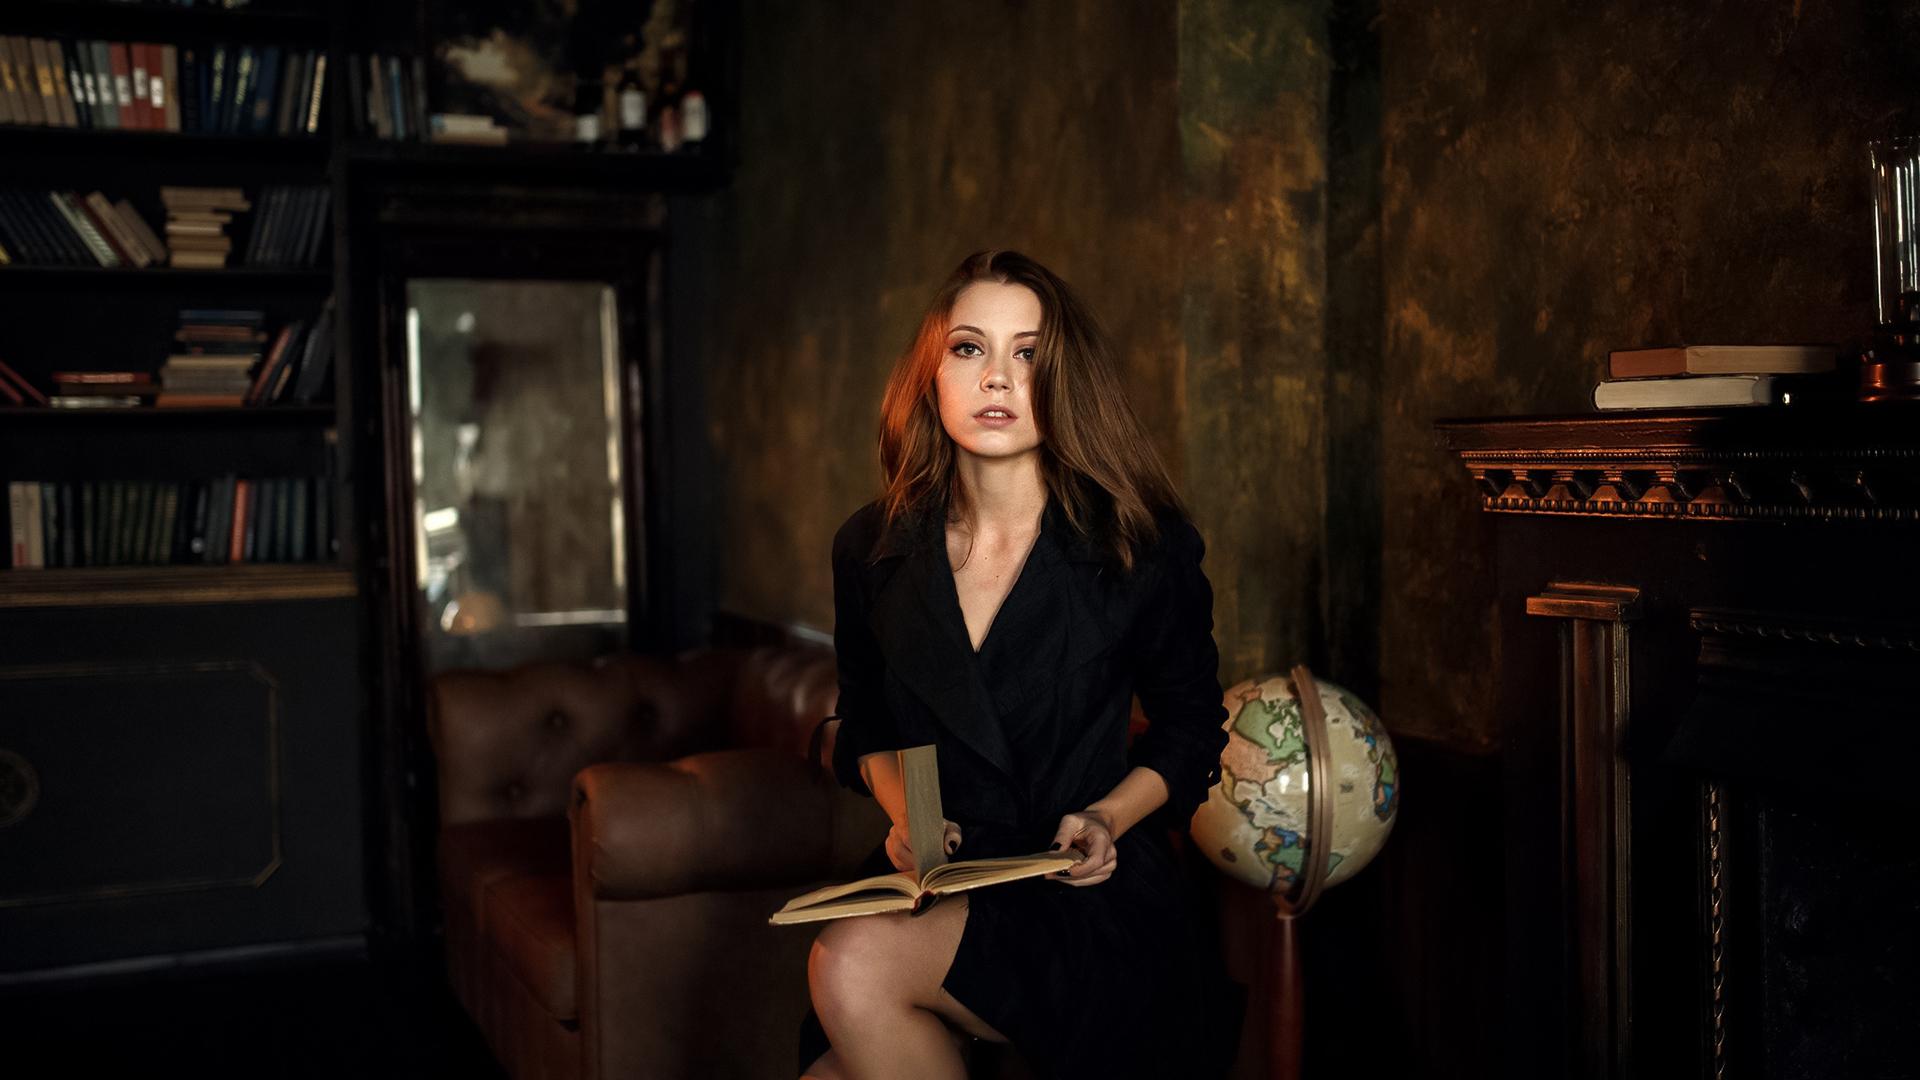 Alexey Kishechkin Women Ksenia Kokoreva Brunette Looking At Viewer Black Clothing Books Globe Indoor 1920x1080